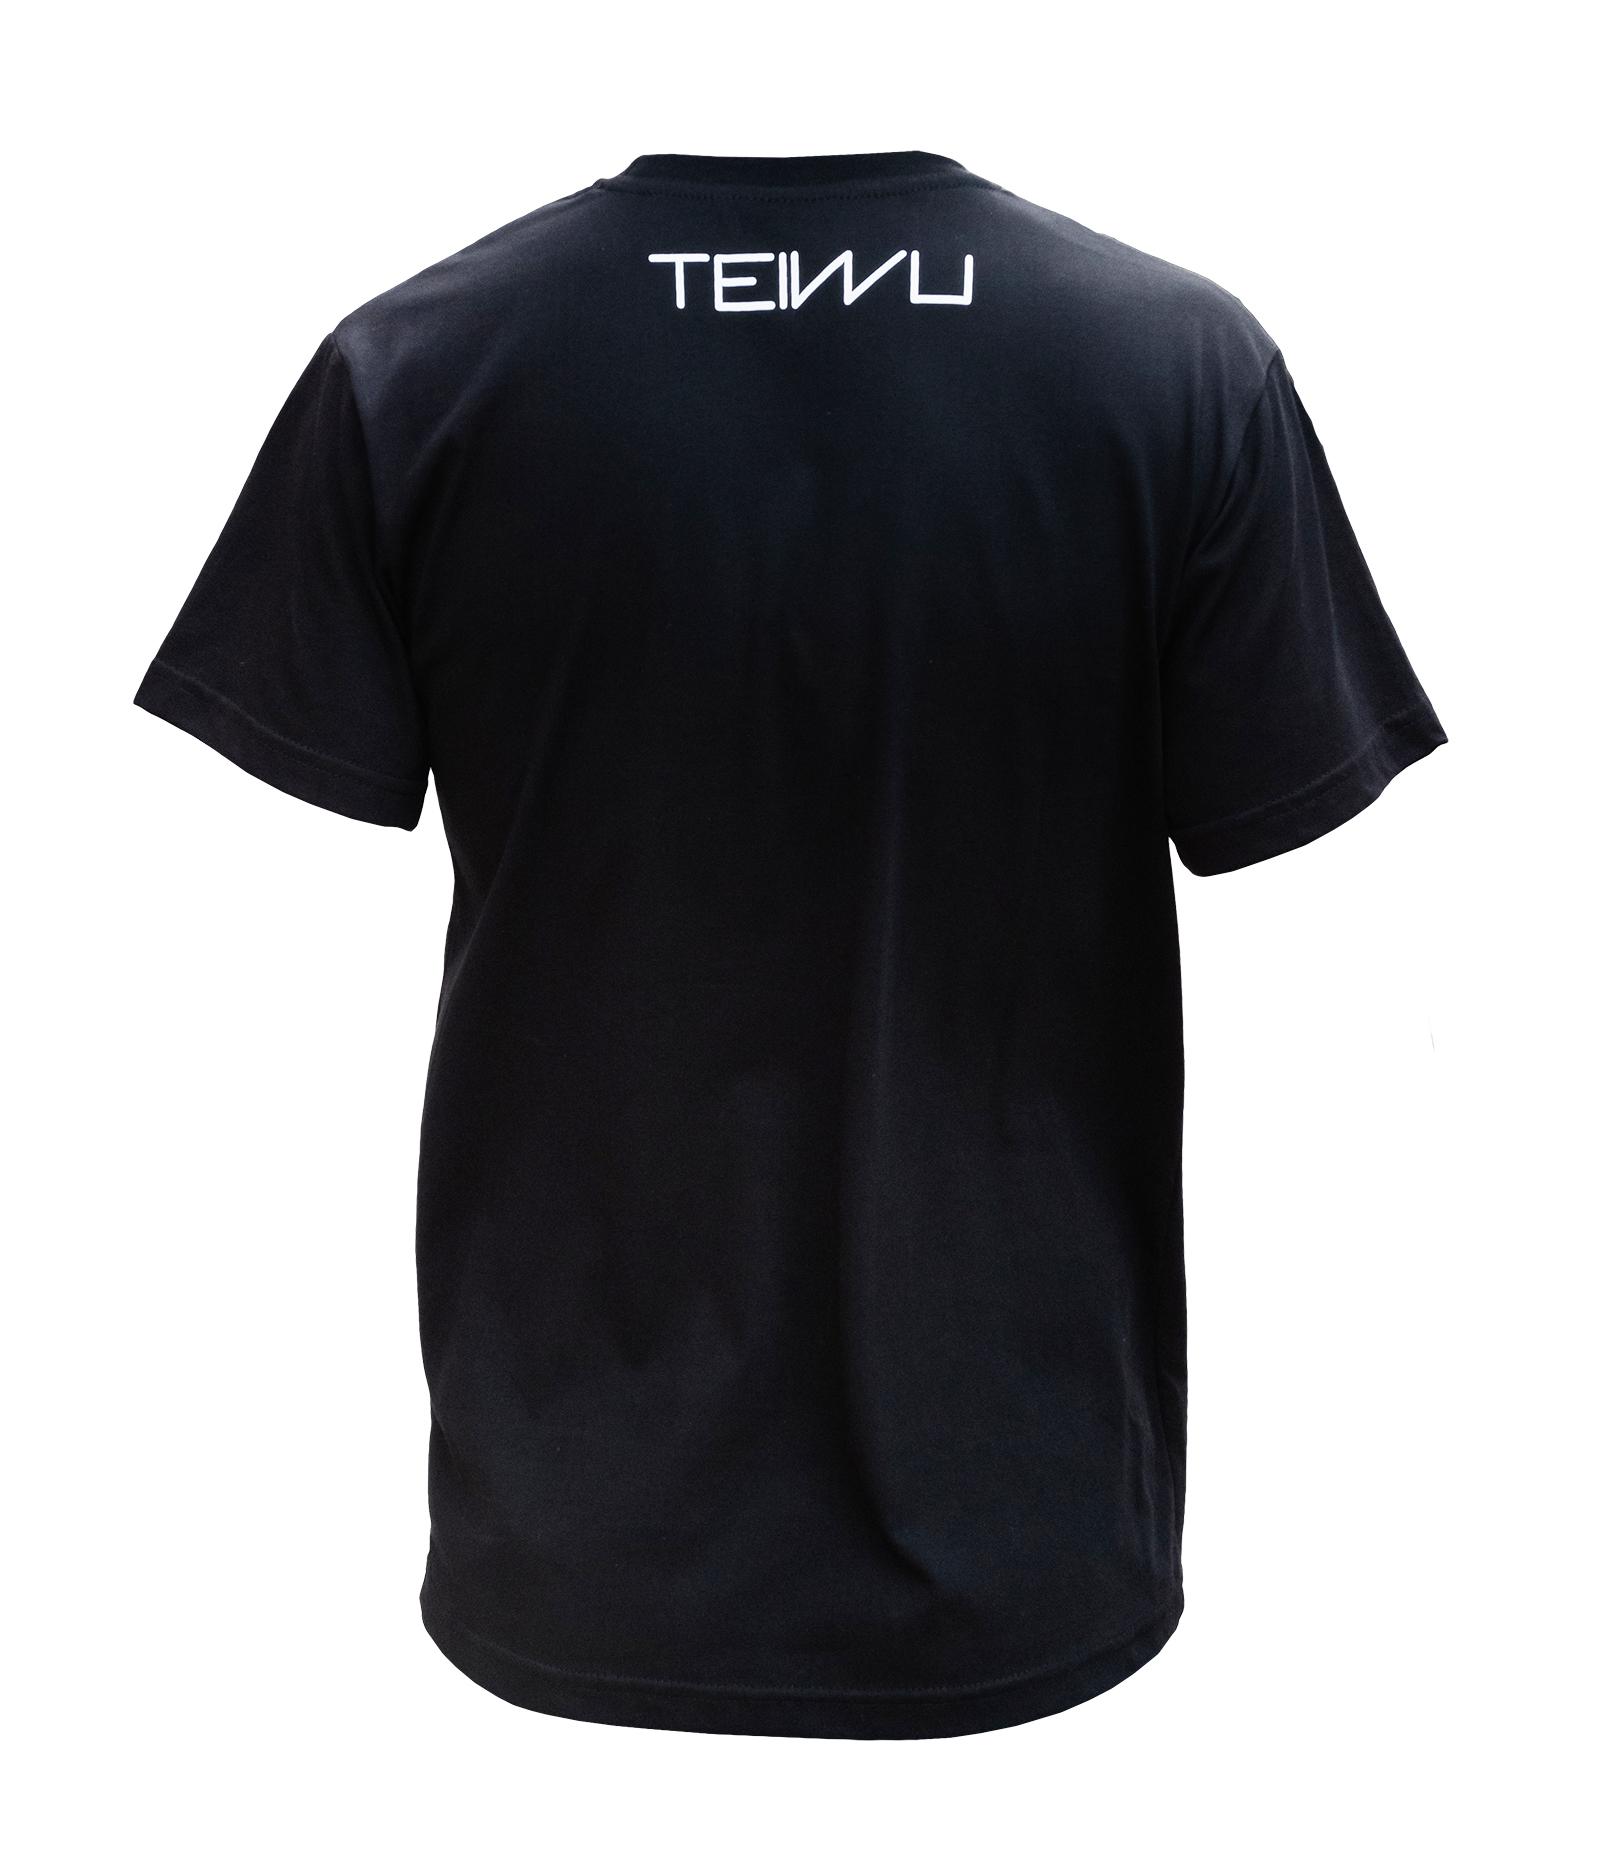 TIW_BLACK_BACK